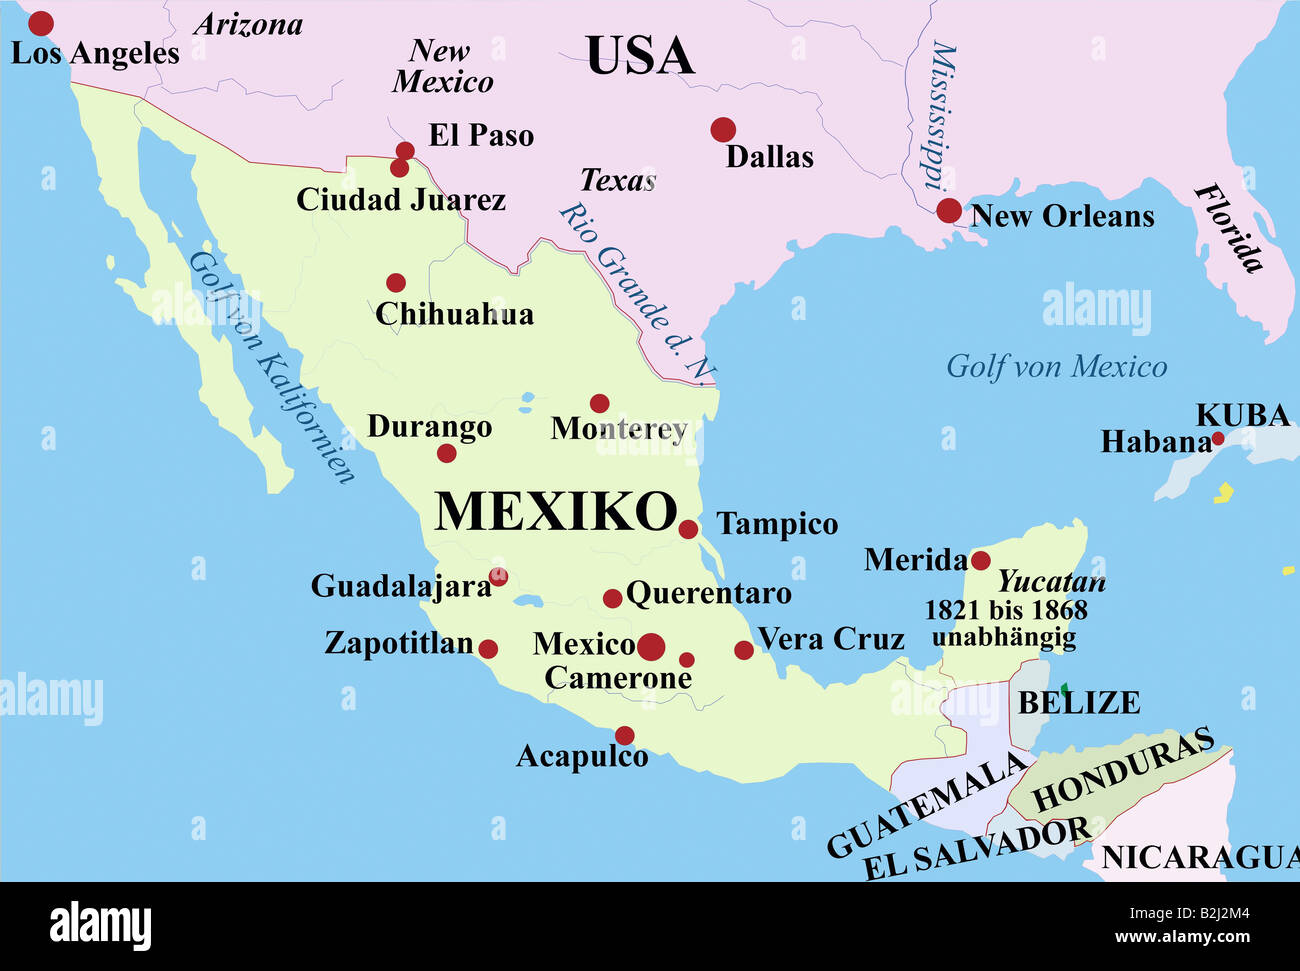 cartography historical maps mexico 19th century yucatan 1821 1868 guatemala belize el salvador nicaragua usa rio gra